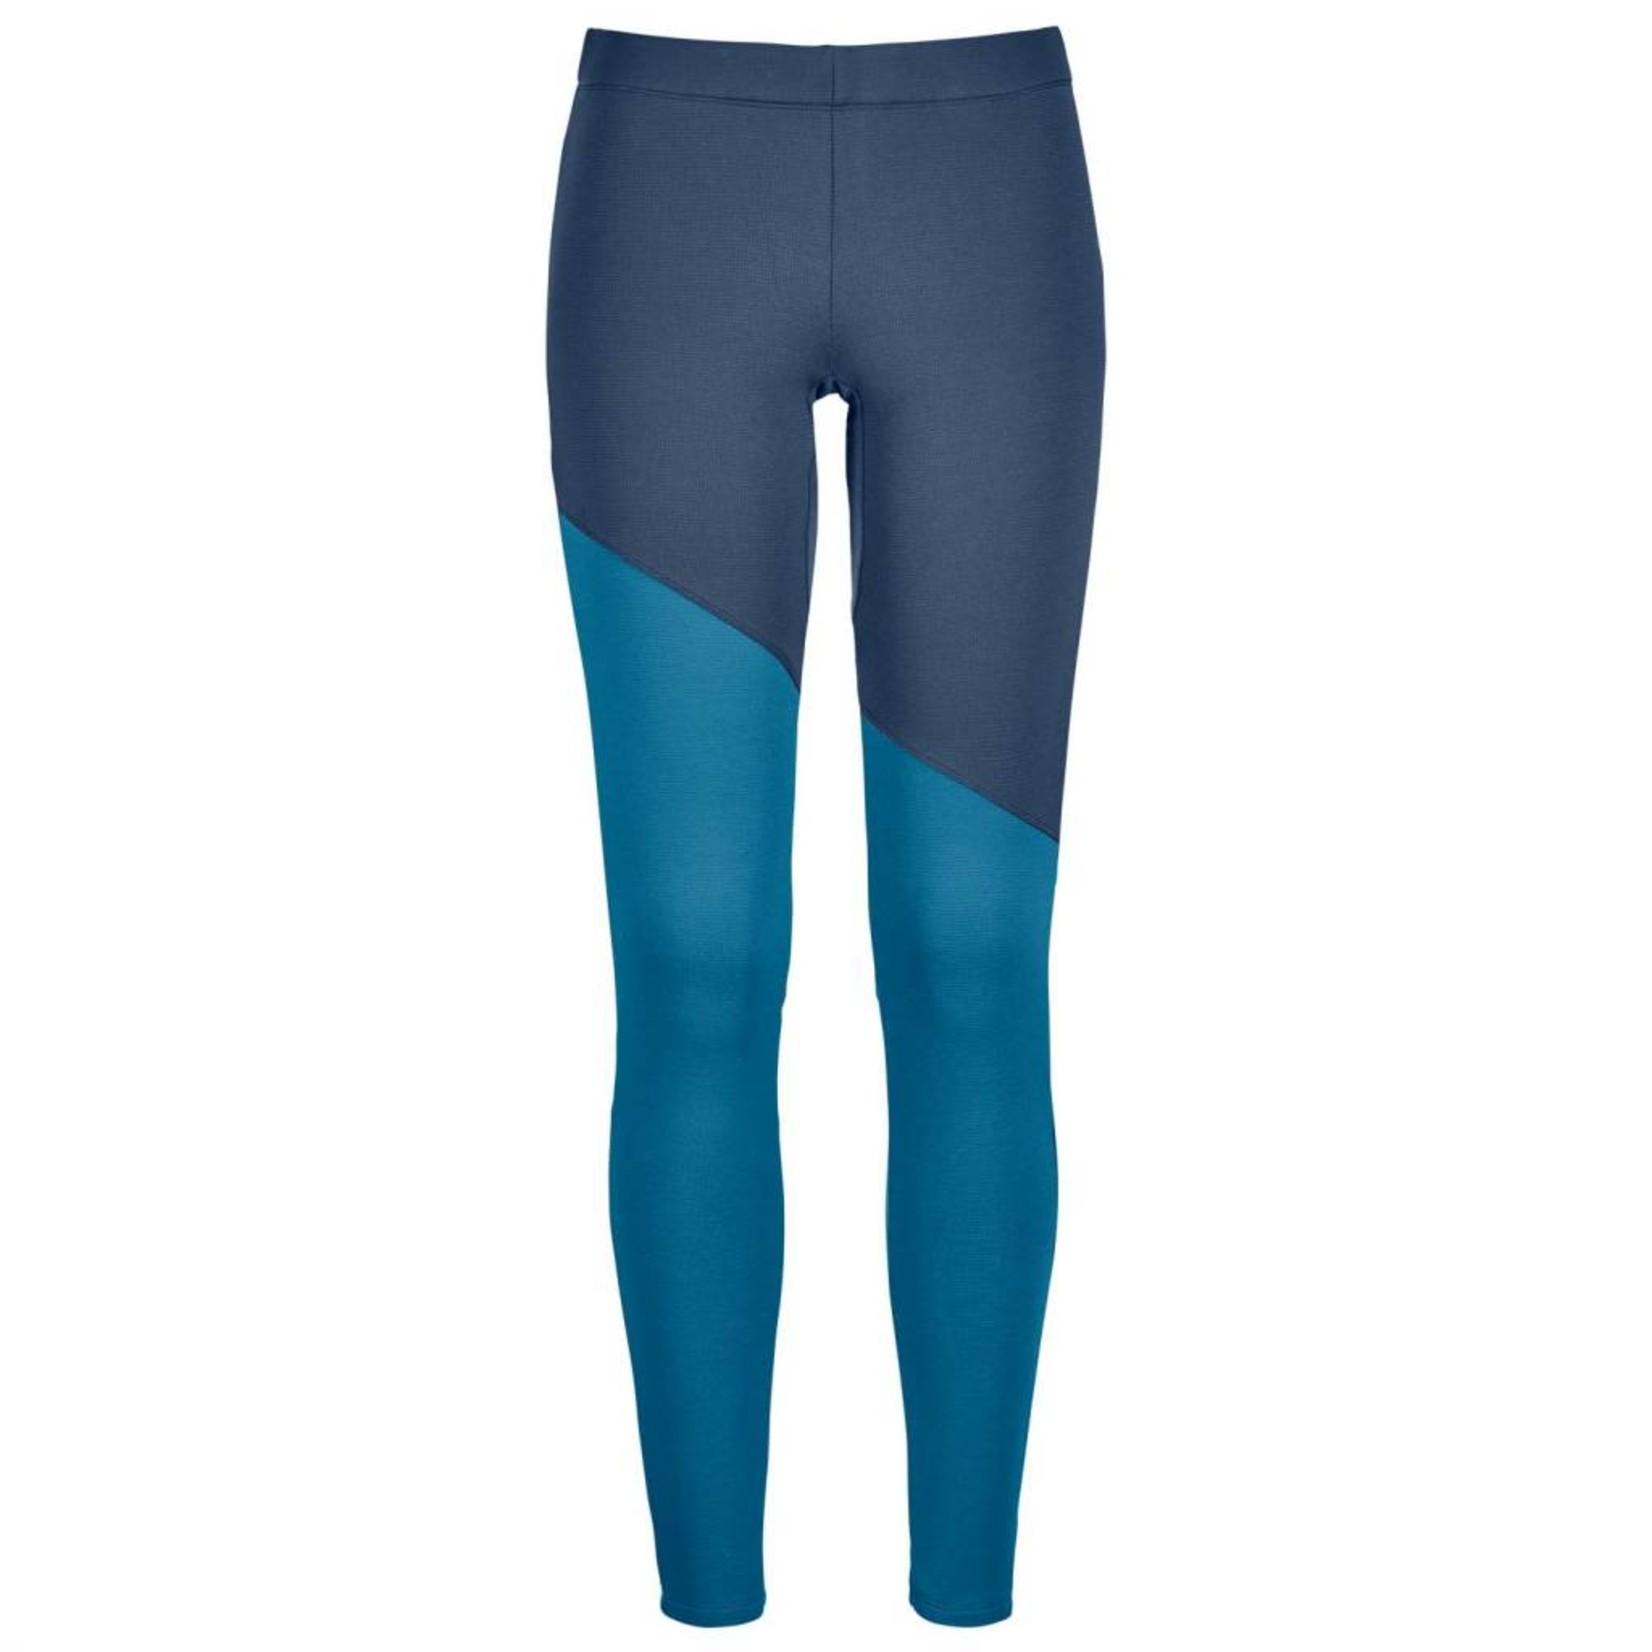 Ortovox Ortovox Fleece Light Long Pants - Femme